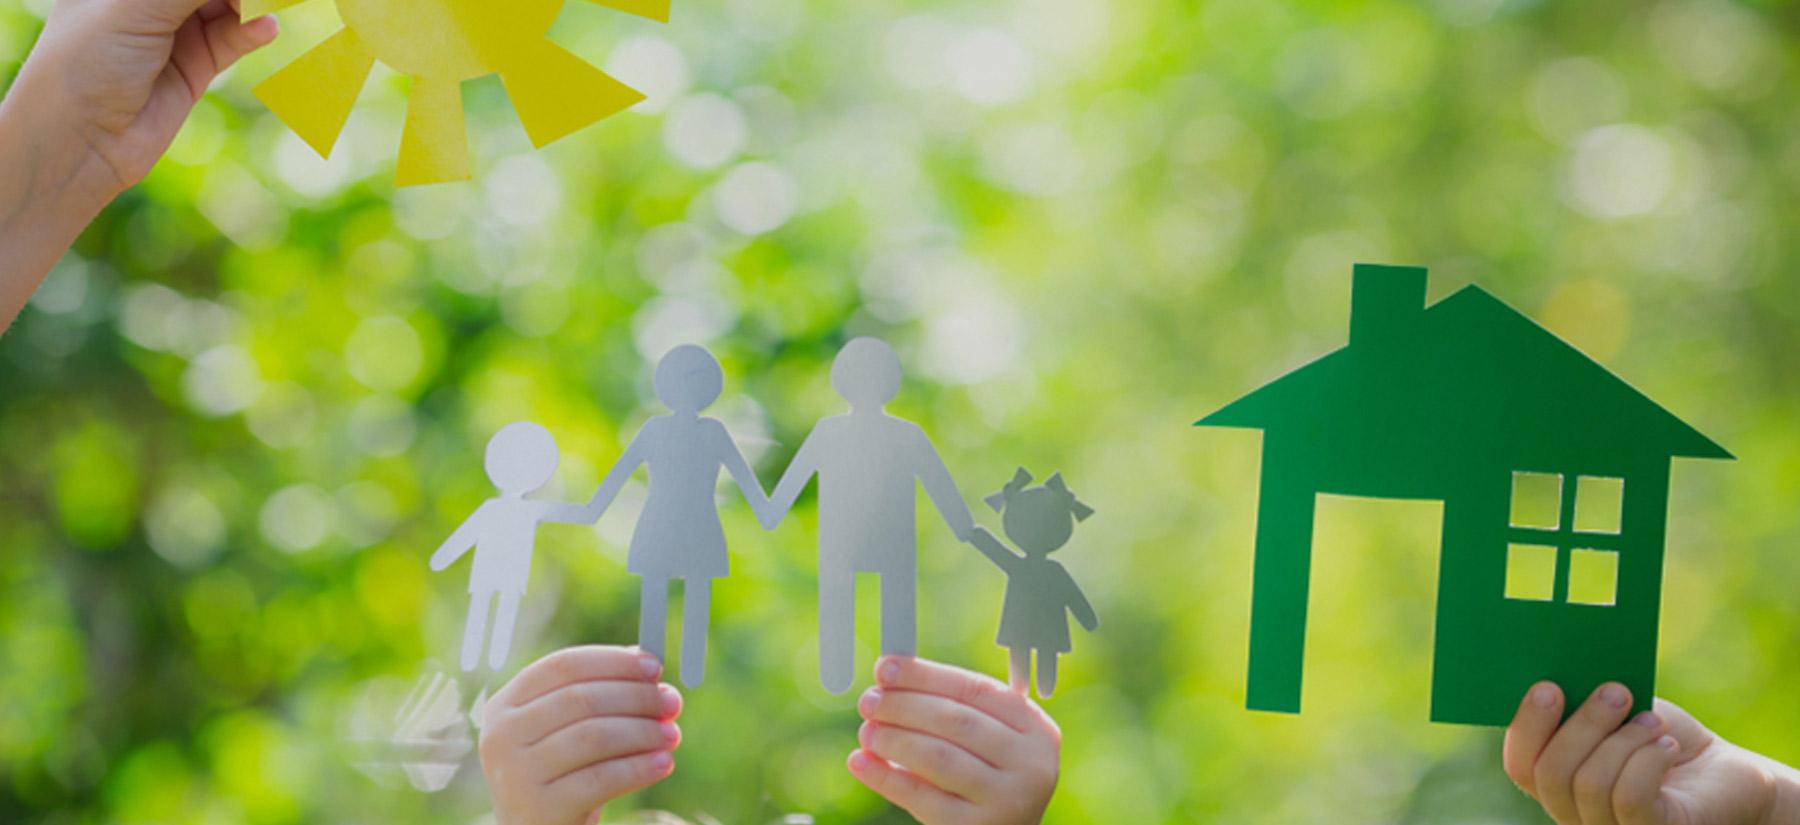 create a sustainable future